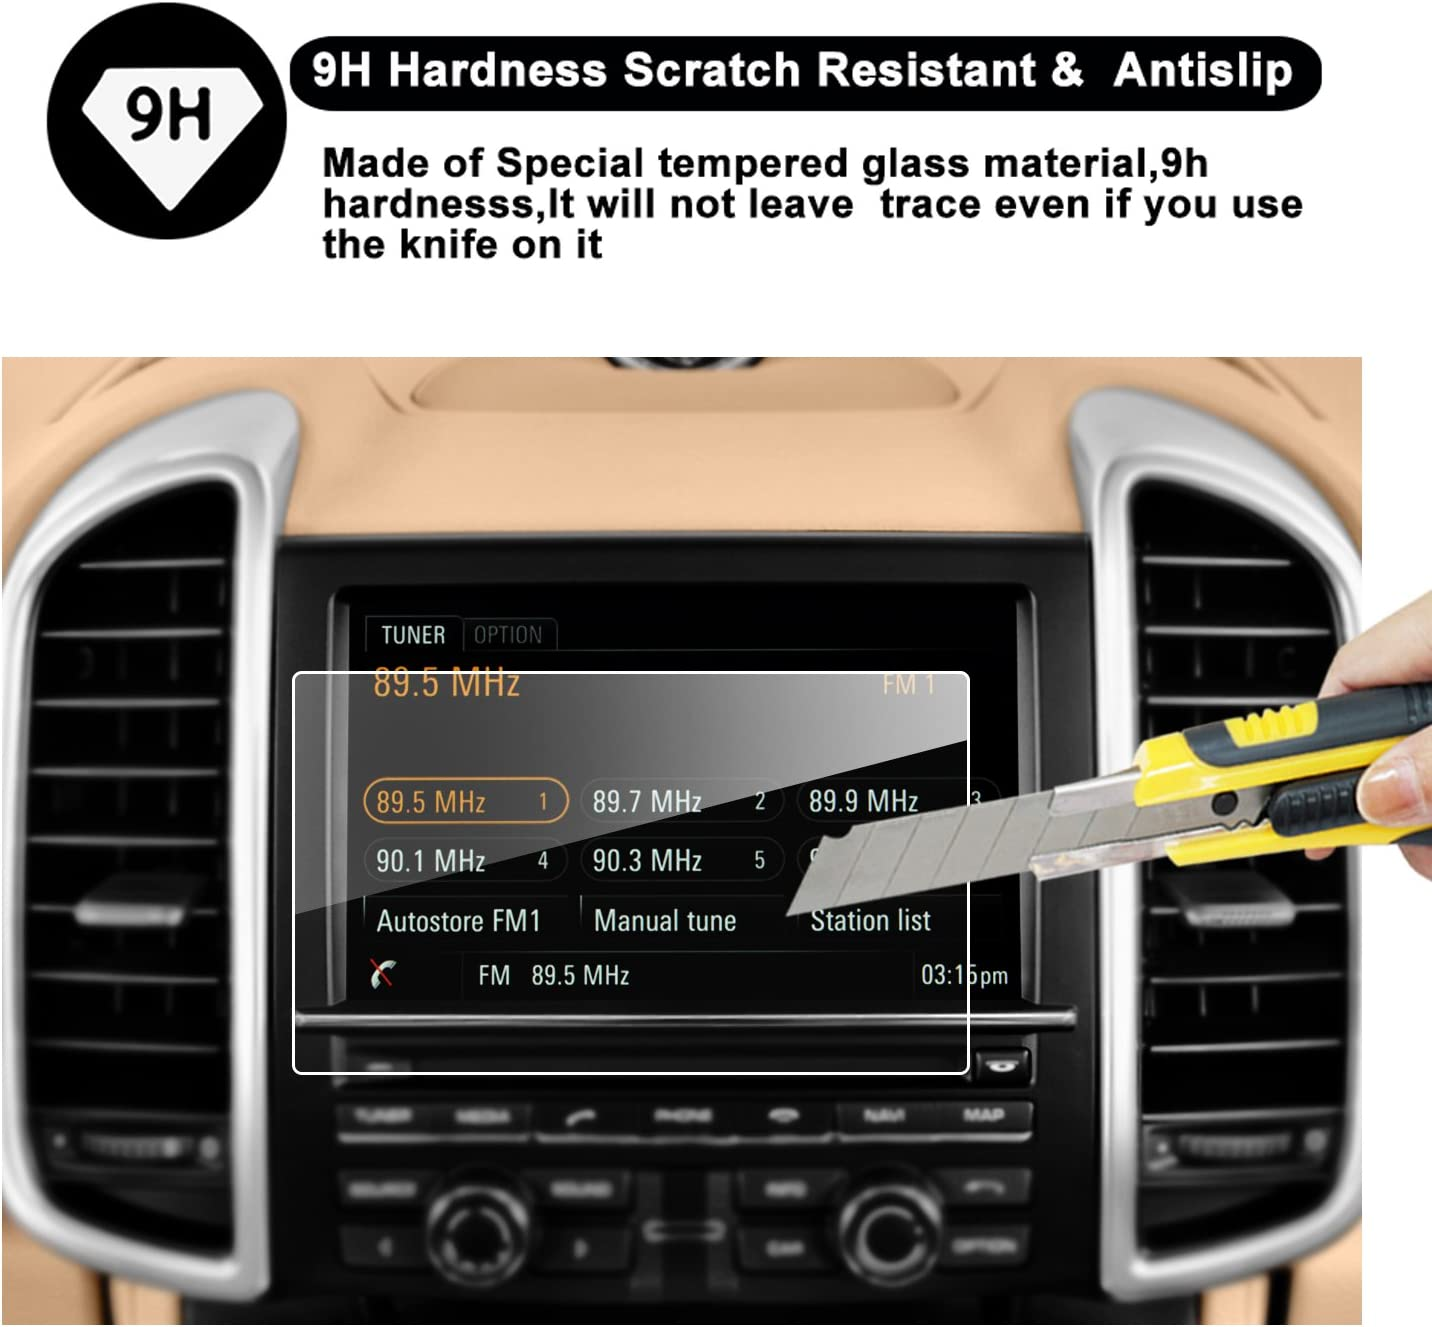 RUIYA 2015-2016 Porsche Cayenne//Porsche Macan Coupe//Hatchback 7-Inch in-Dash Navigation Screen Protector High Clarity 2015-2016 Porsche Cayenne//Porsche Macan Anti-Fingerprint /& Anti-Scratch